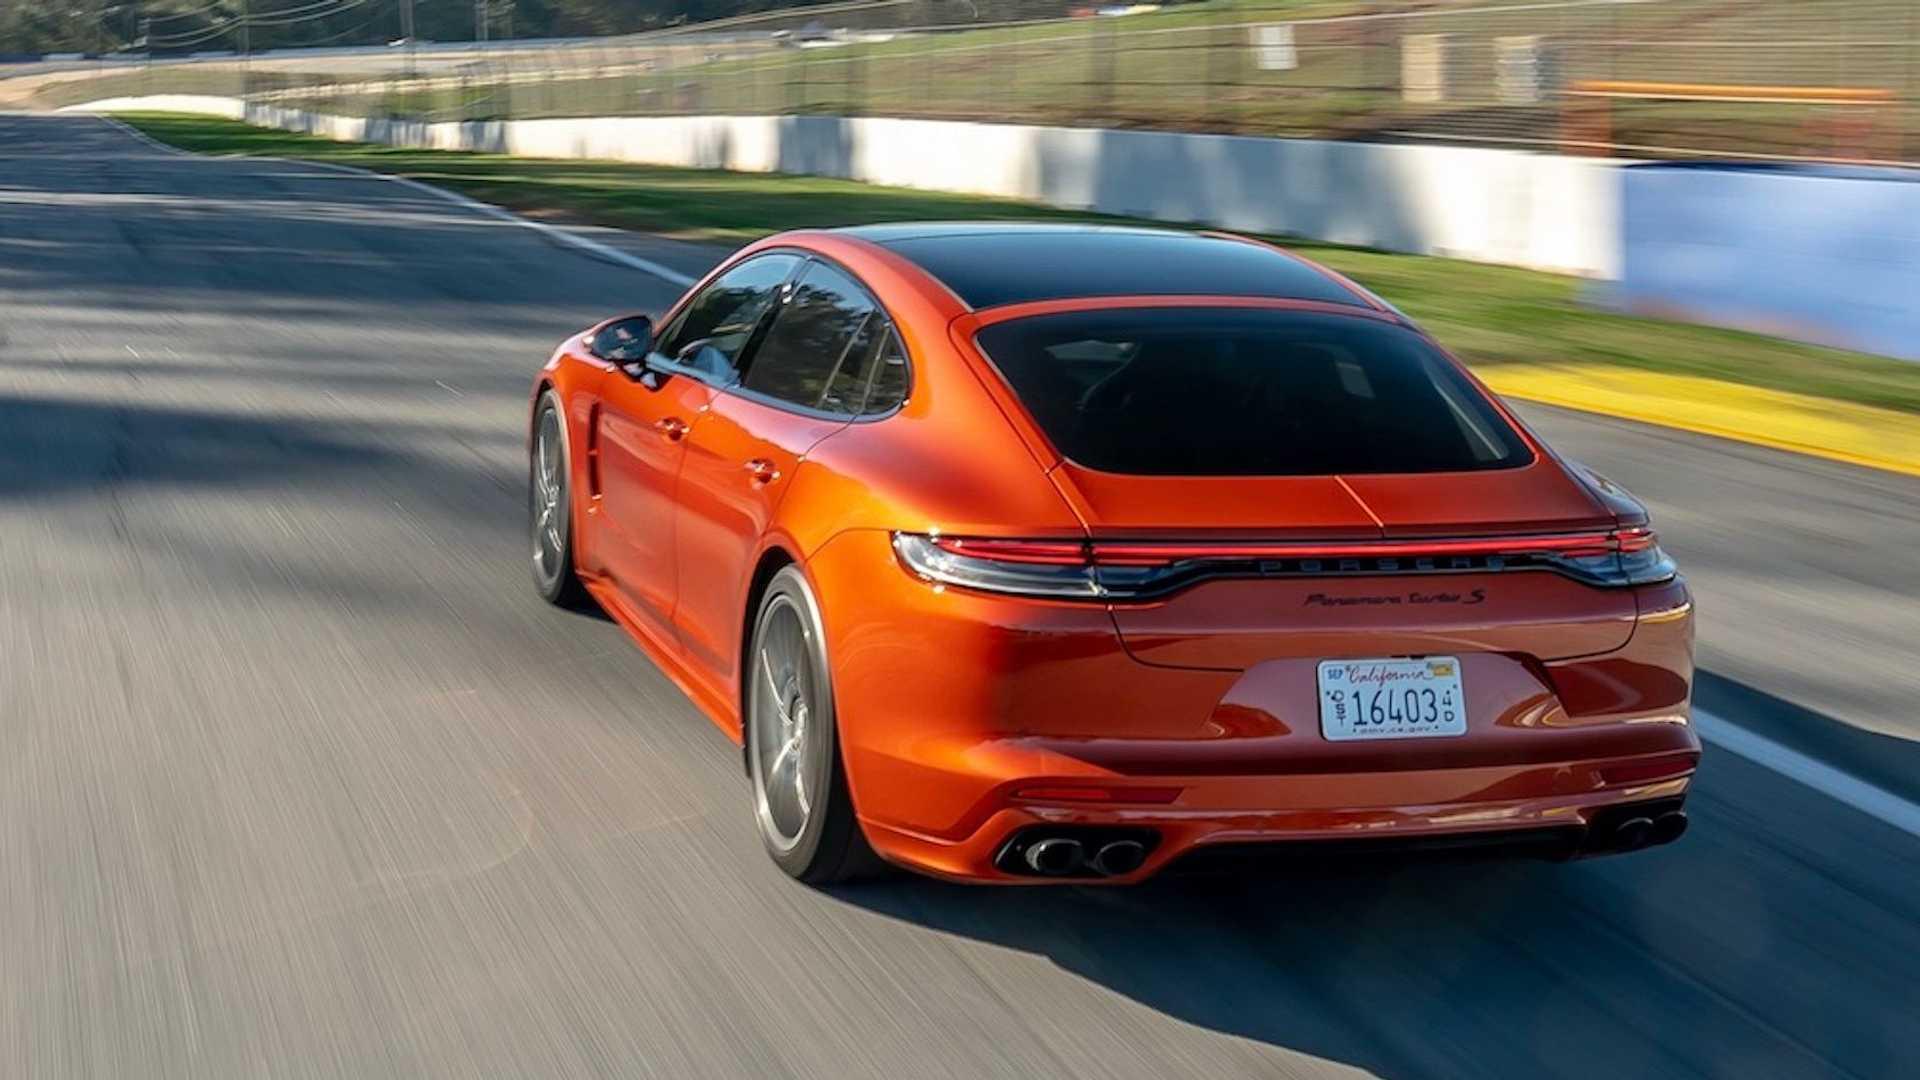 Porsche-Panamera-Turbo-Record-Road-Atlanta-14